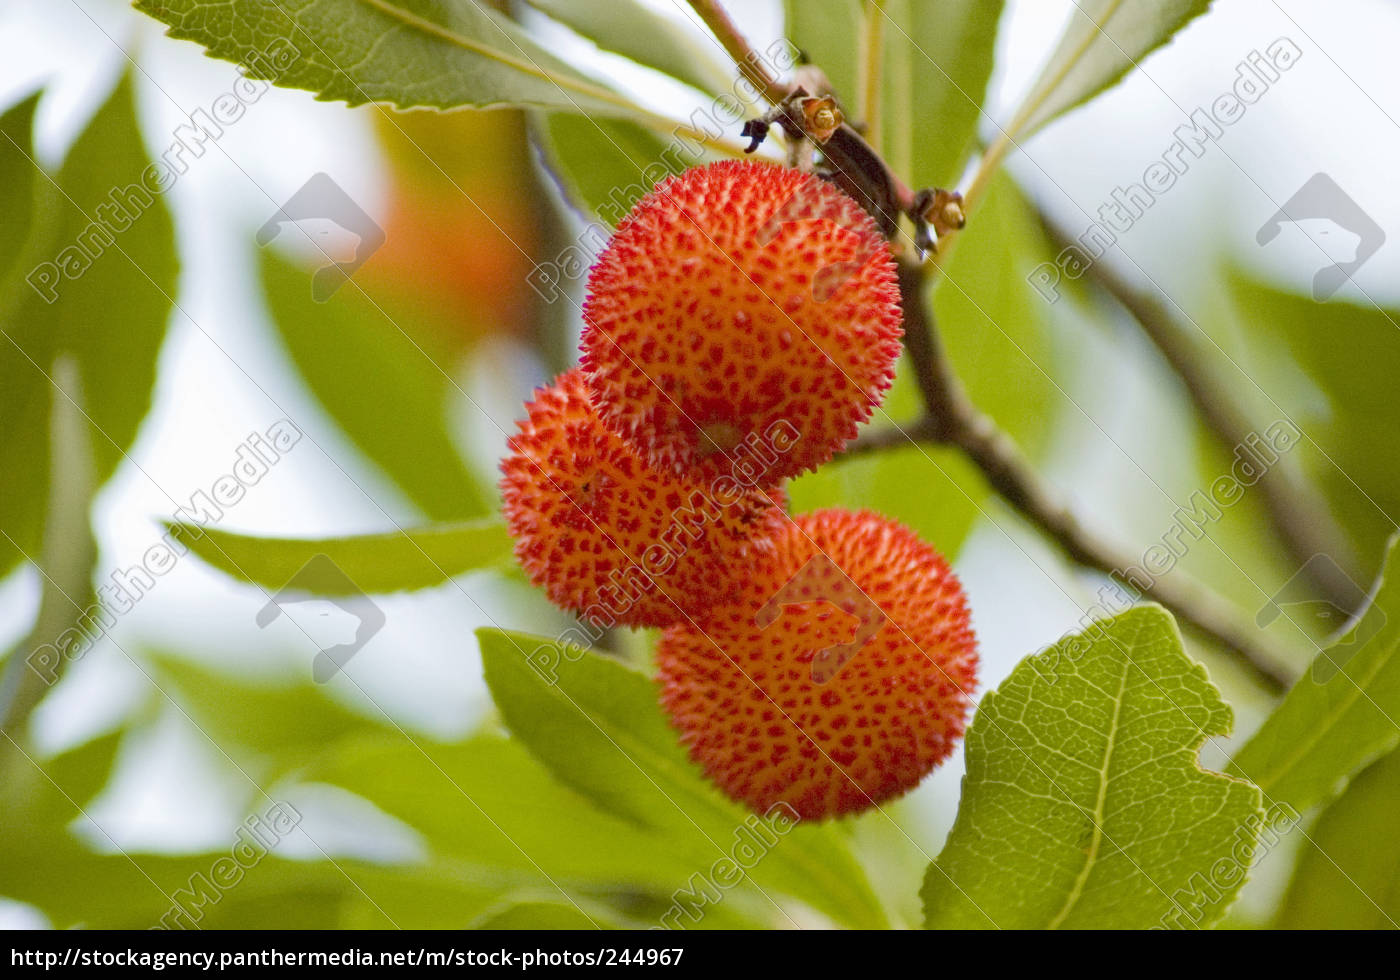 strawberry, tree, fruits, 2 - 244967